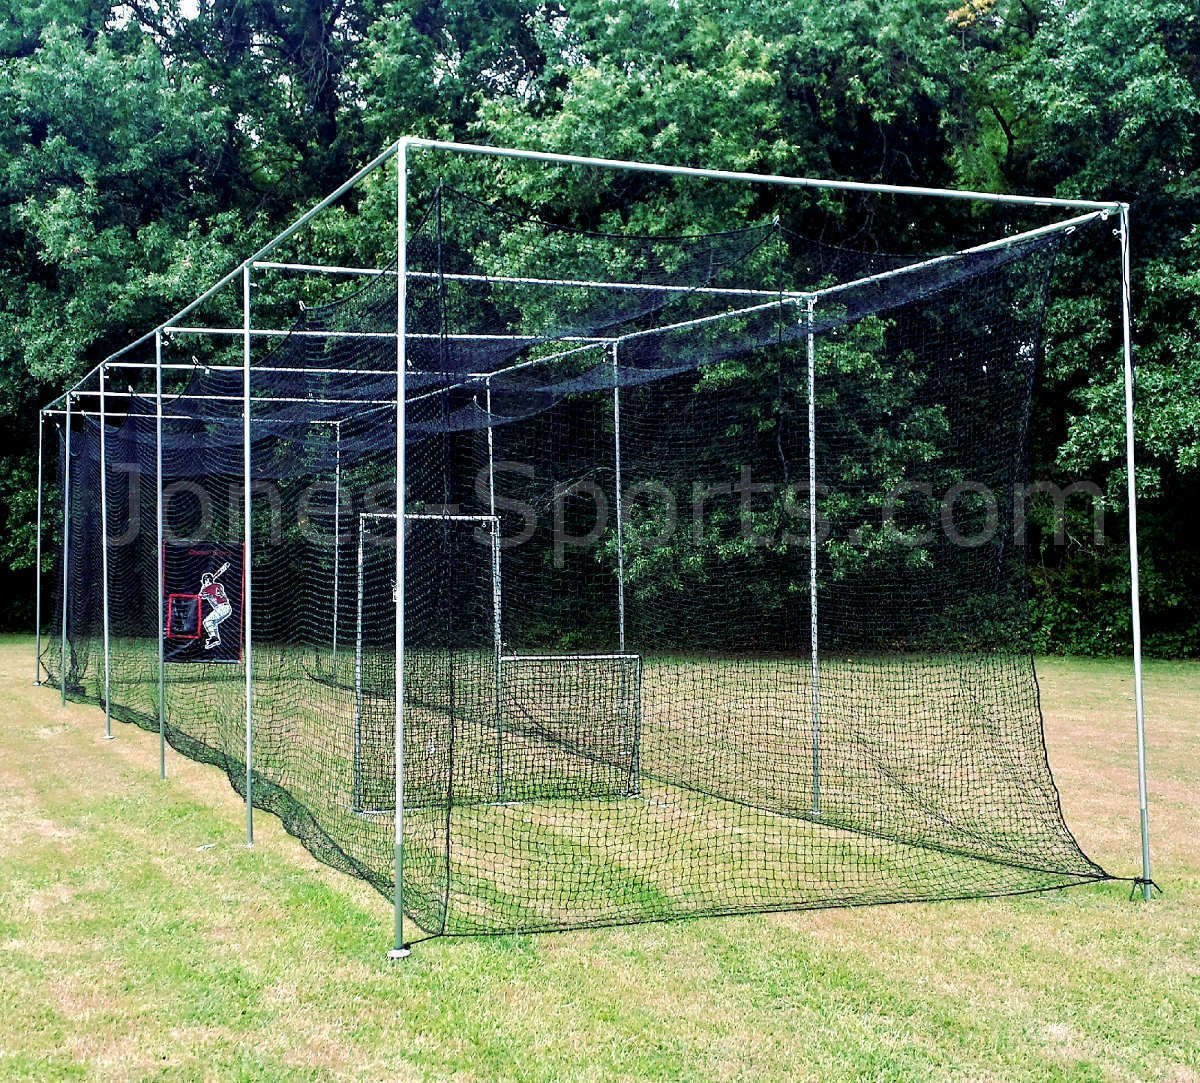 Jones-Sports Heavy Duty 10 x 12 x 30 #42( 60 Ply) Batting Cage Net with Door for Softball, Baseball by Jones Sports